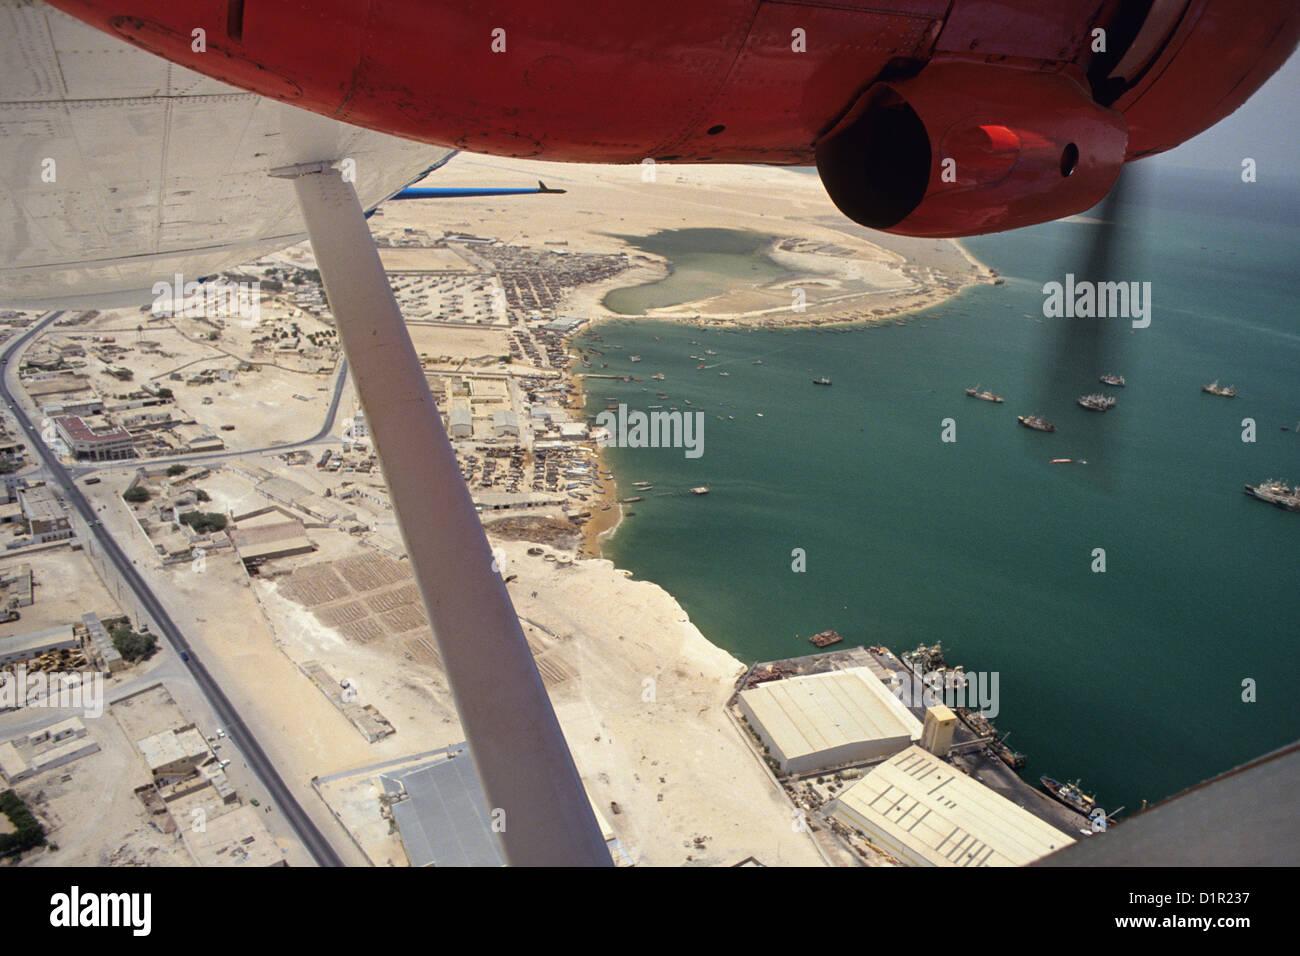 Mauritania, Nouadjibou, Catalina PBY-5A hydroplane. View on fish harbour. - Stock Image